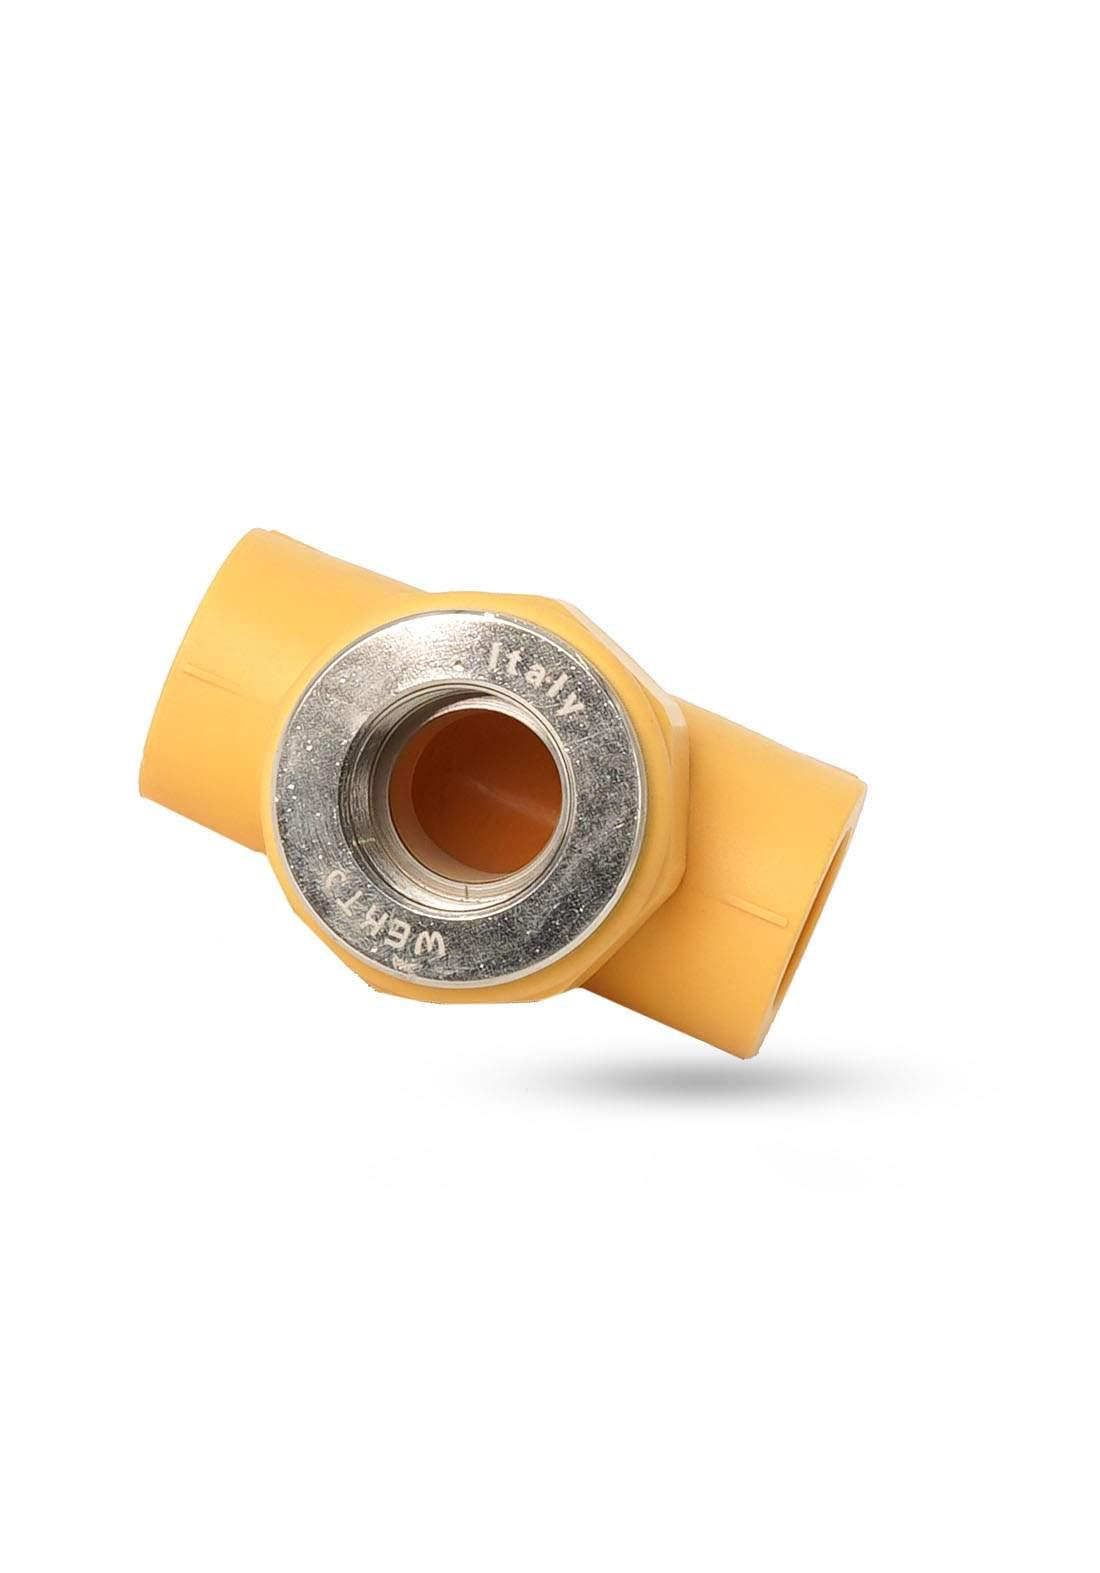 "Wekts 5228 Tooth Separator  for water pipes 25  x 3/4""  تقسيم سن داخلي لأنابيب المياه"